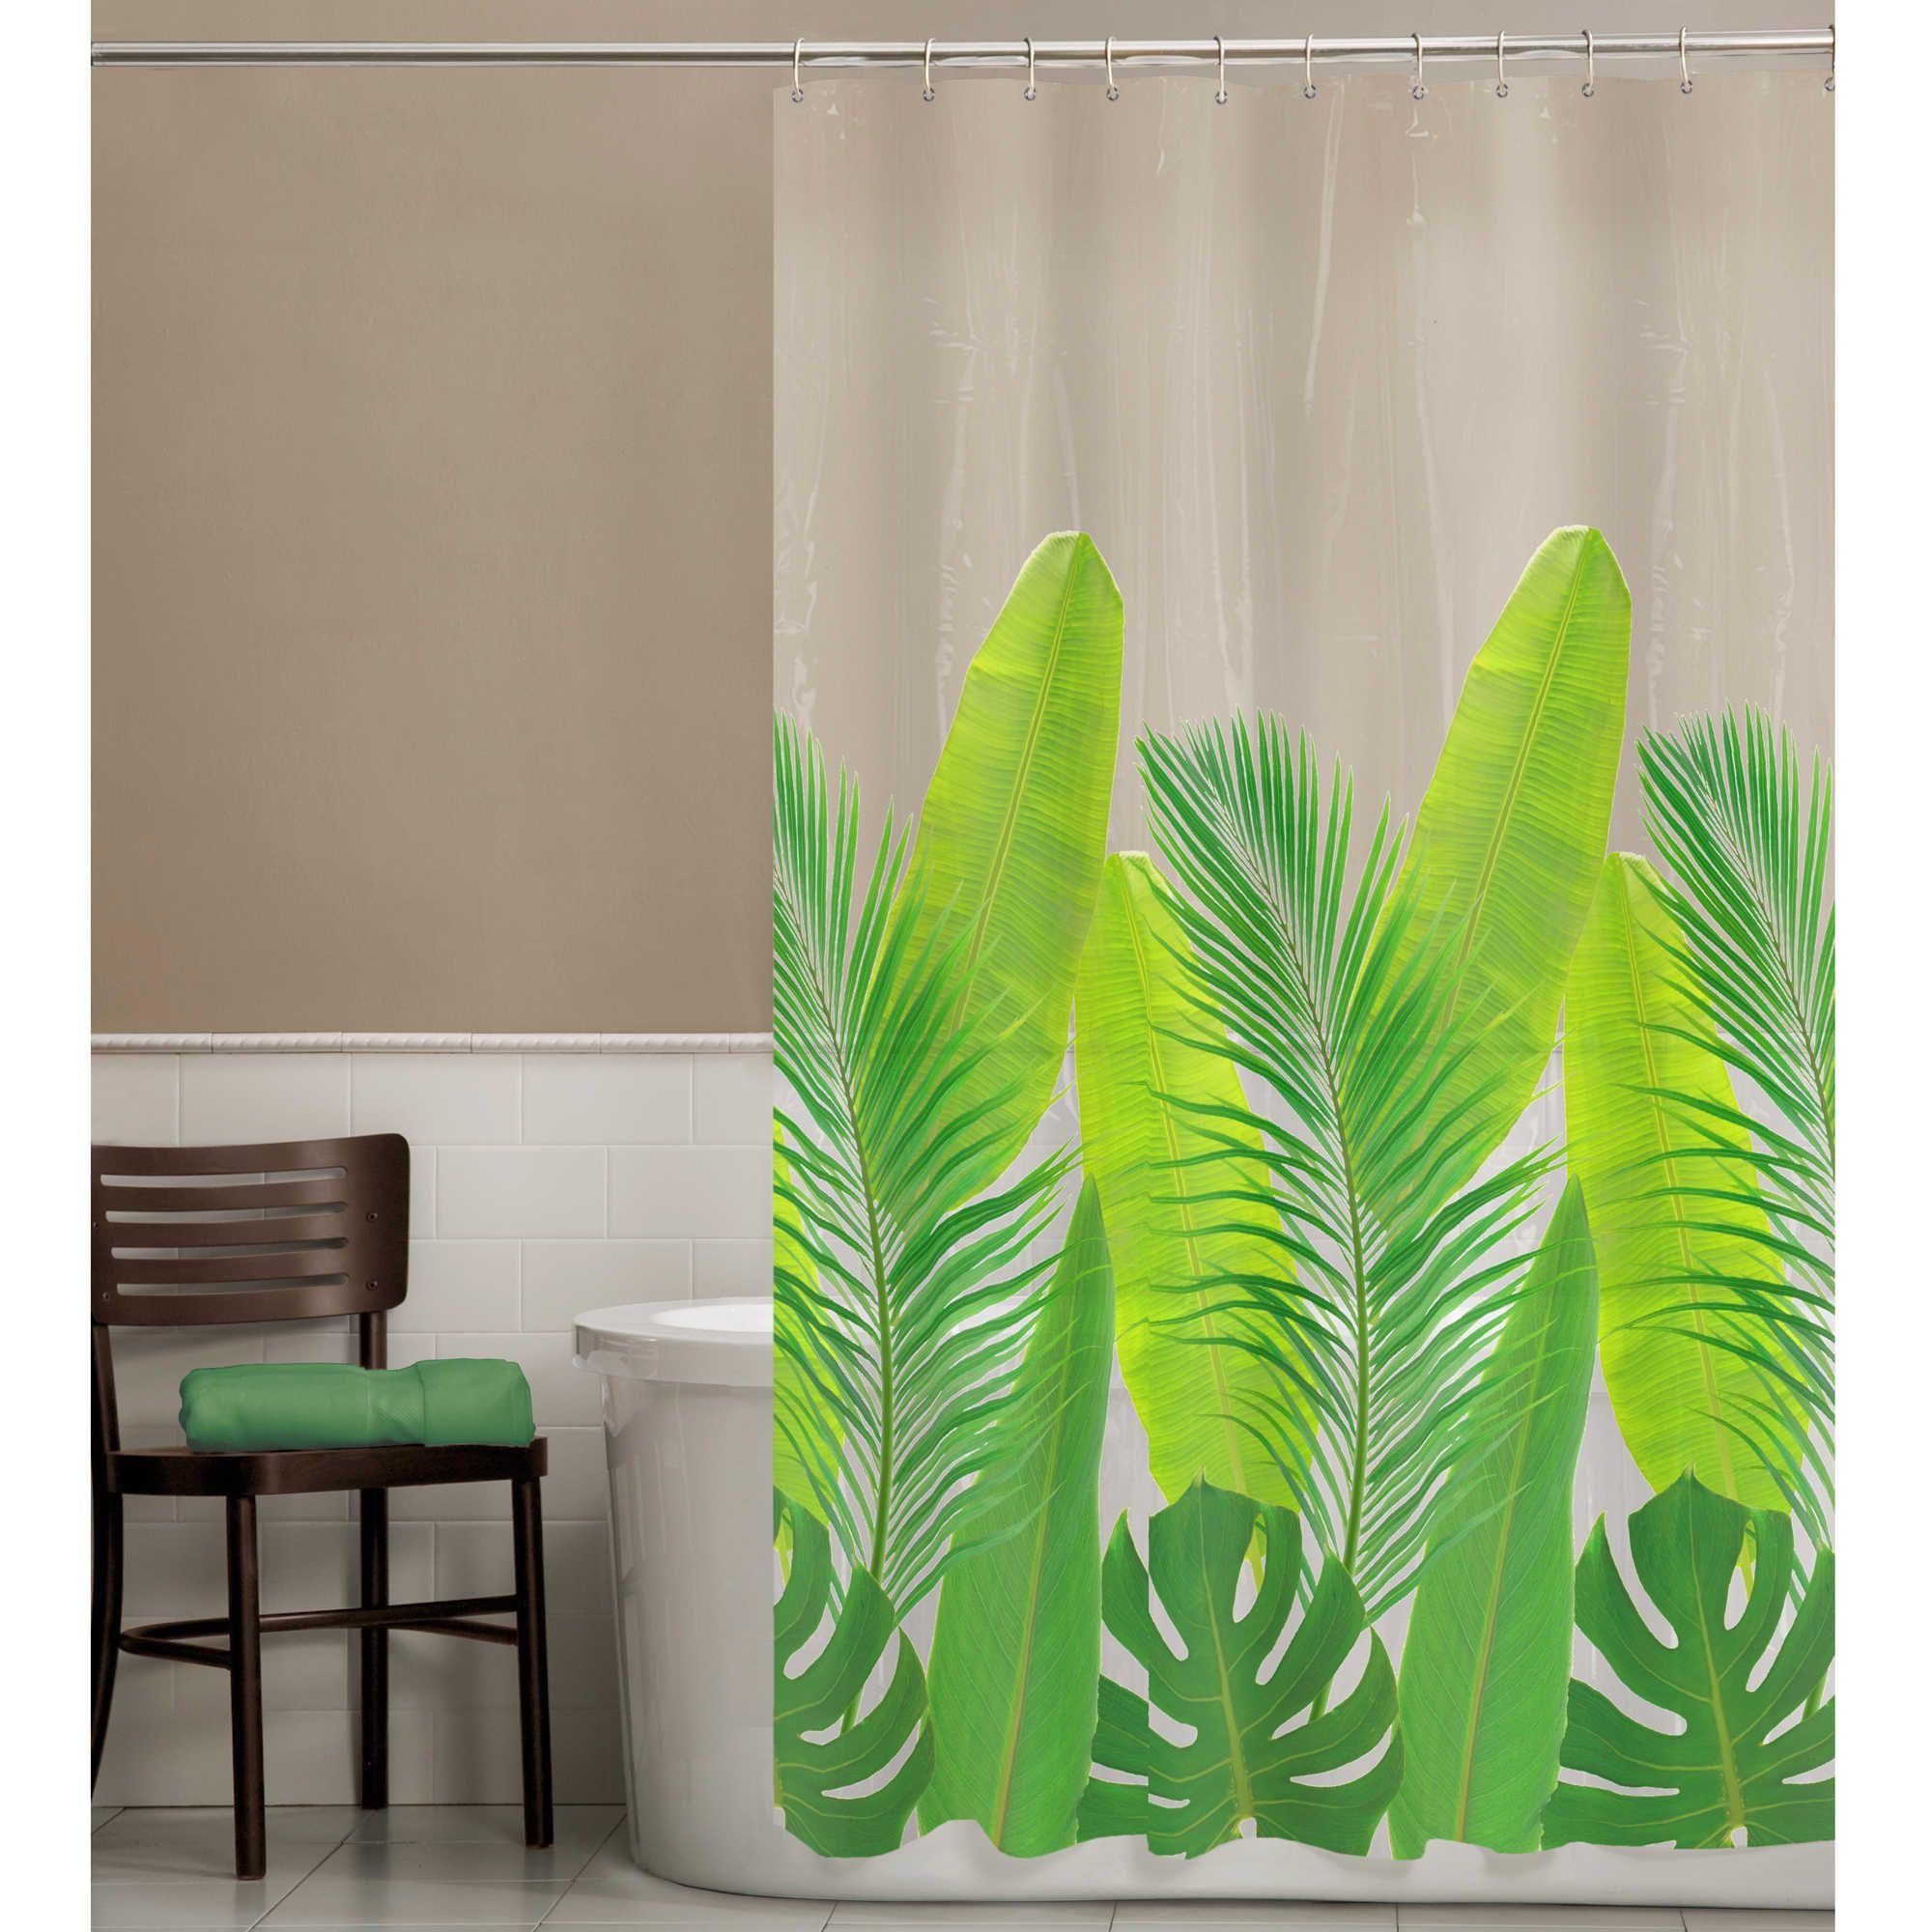 Peva Tropical Leaf Shower Curtain Tropical Leaf Decor Shower Curtain Shower Curtain Track